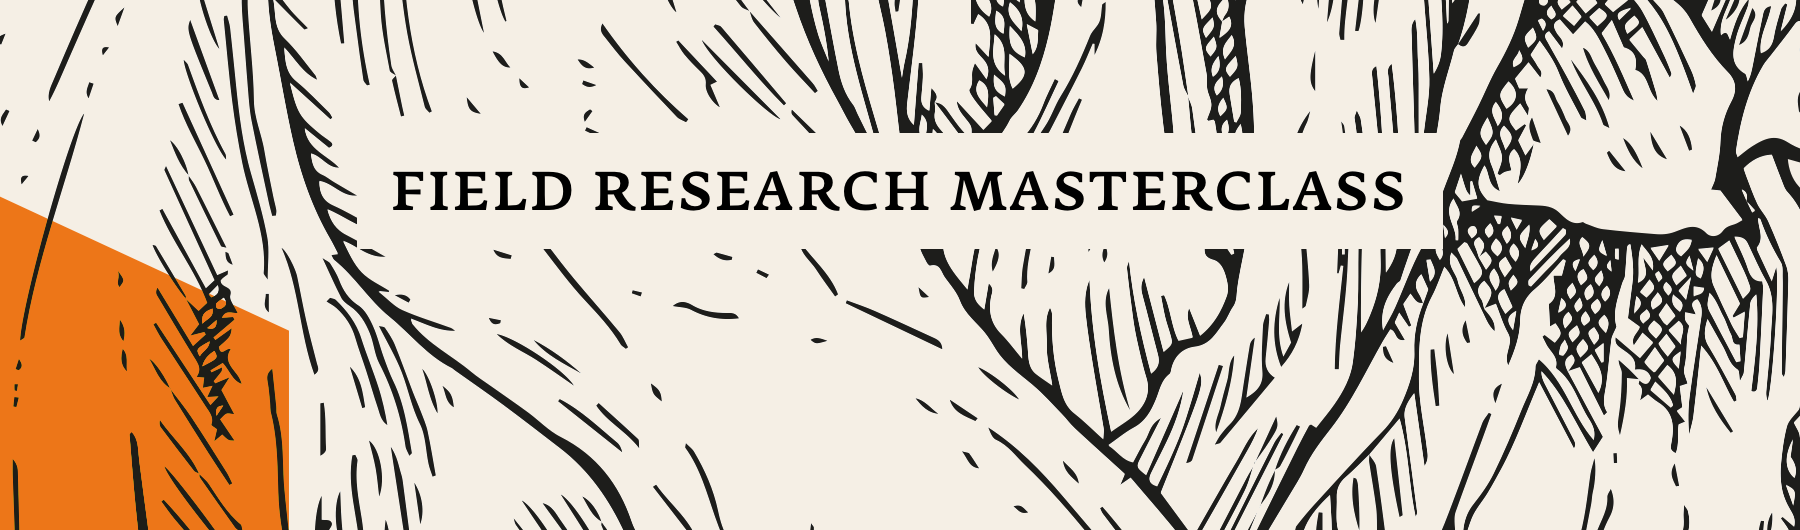 Jan Chipchase - Field Research Masterclass, Brisbane, December 4th